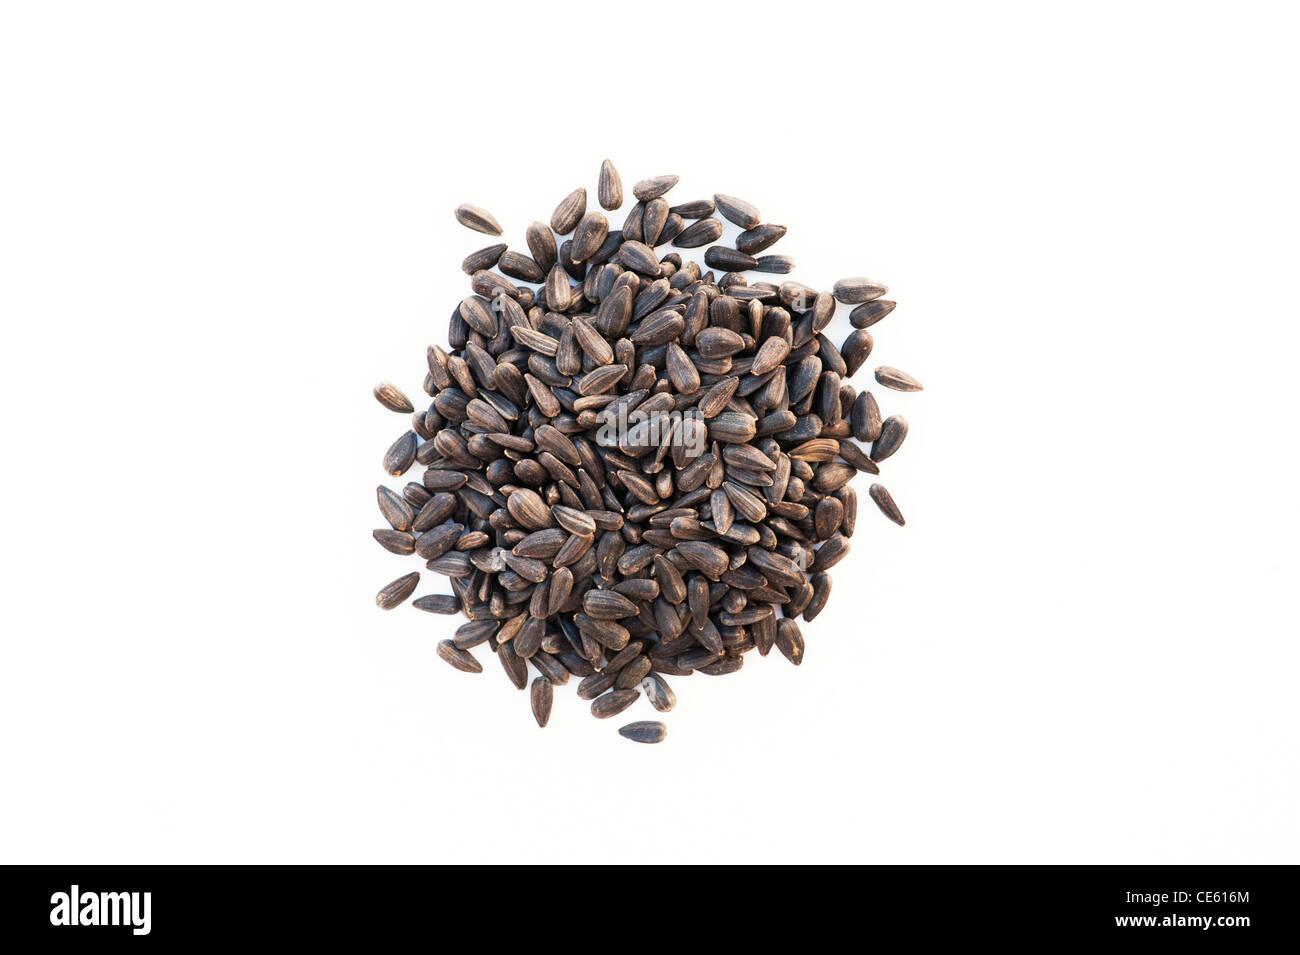 Sunflower seeds on white background - Stock Image